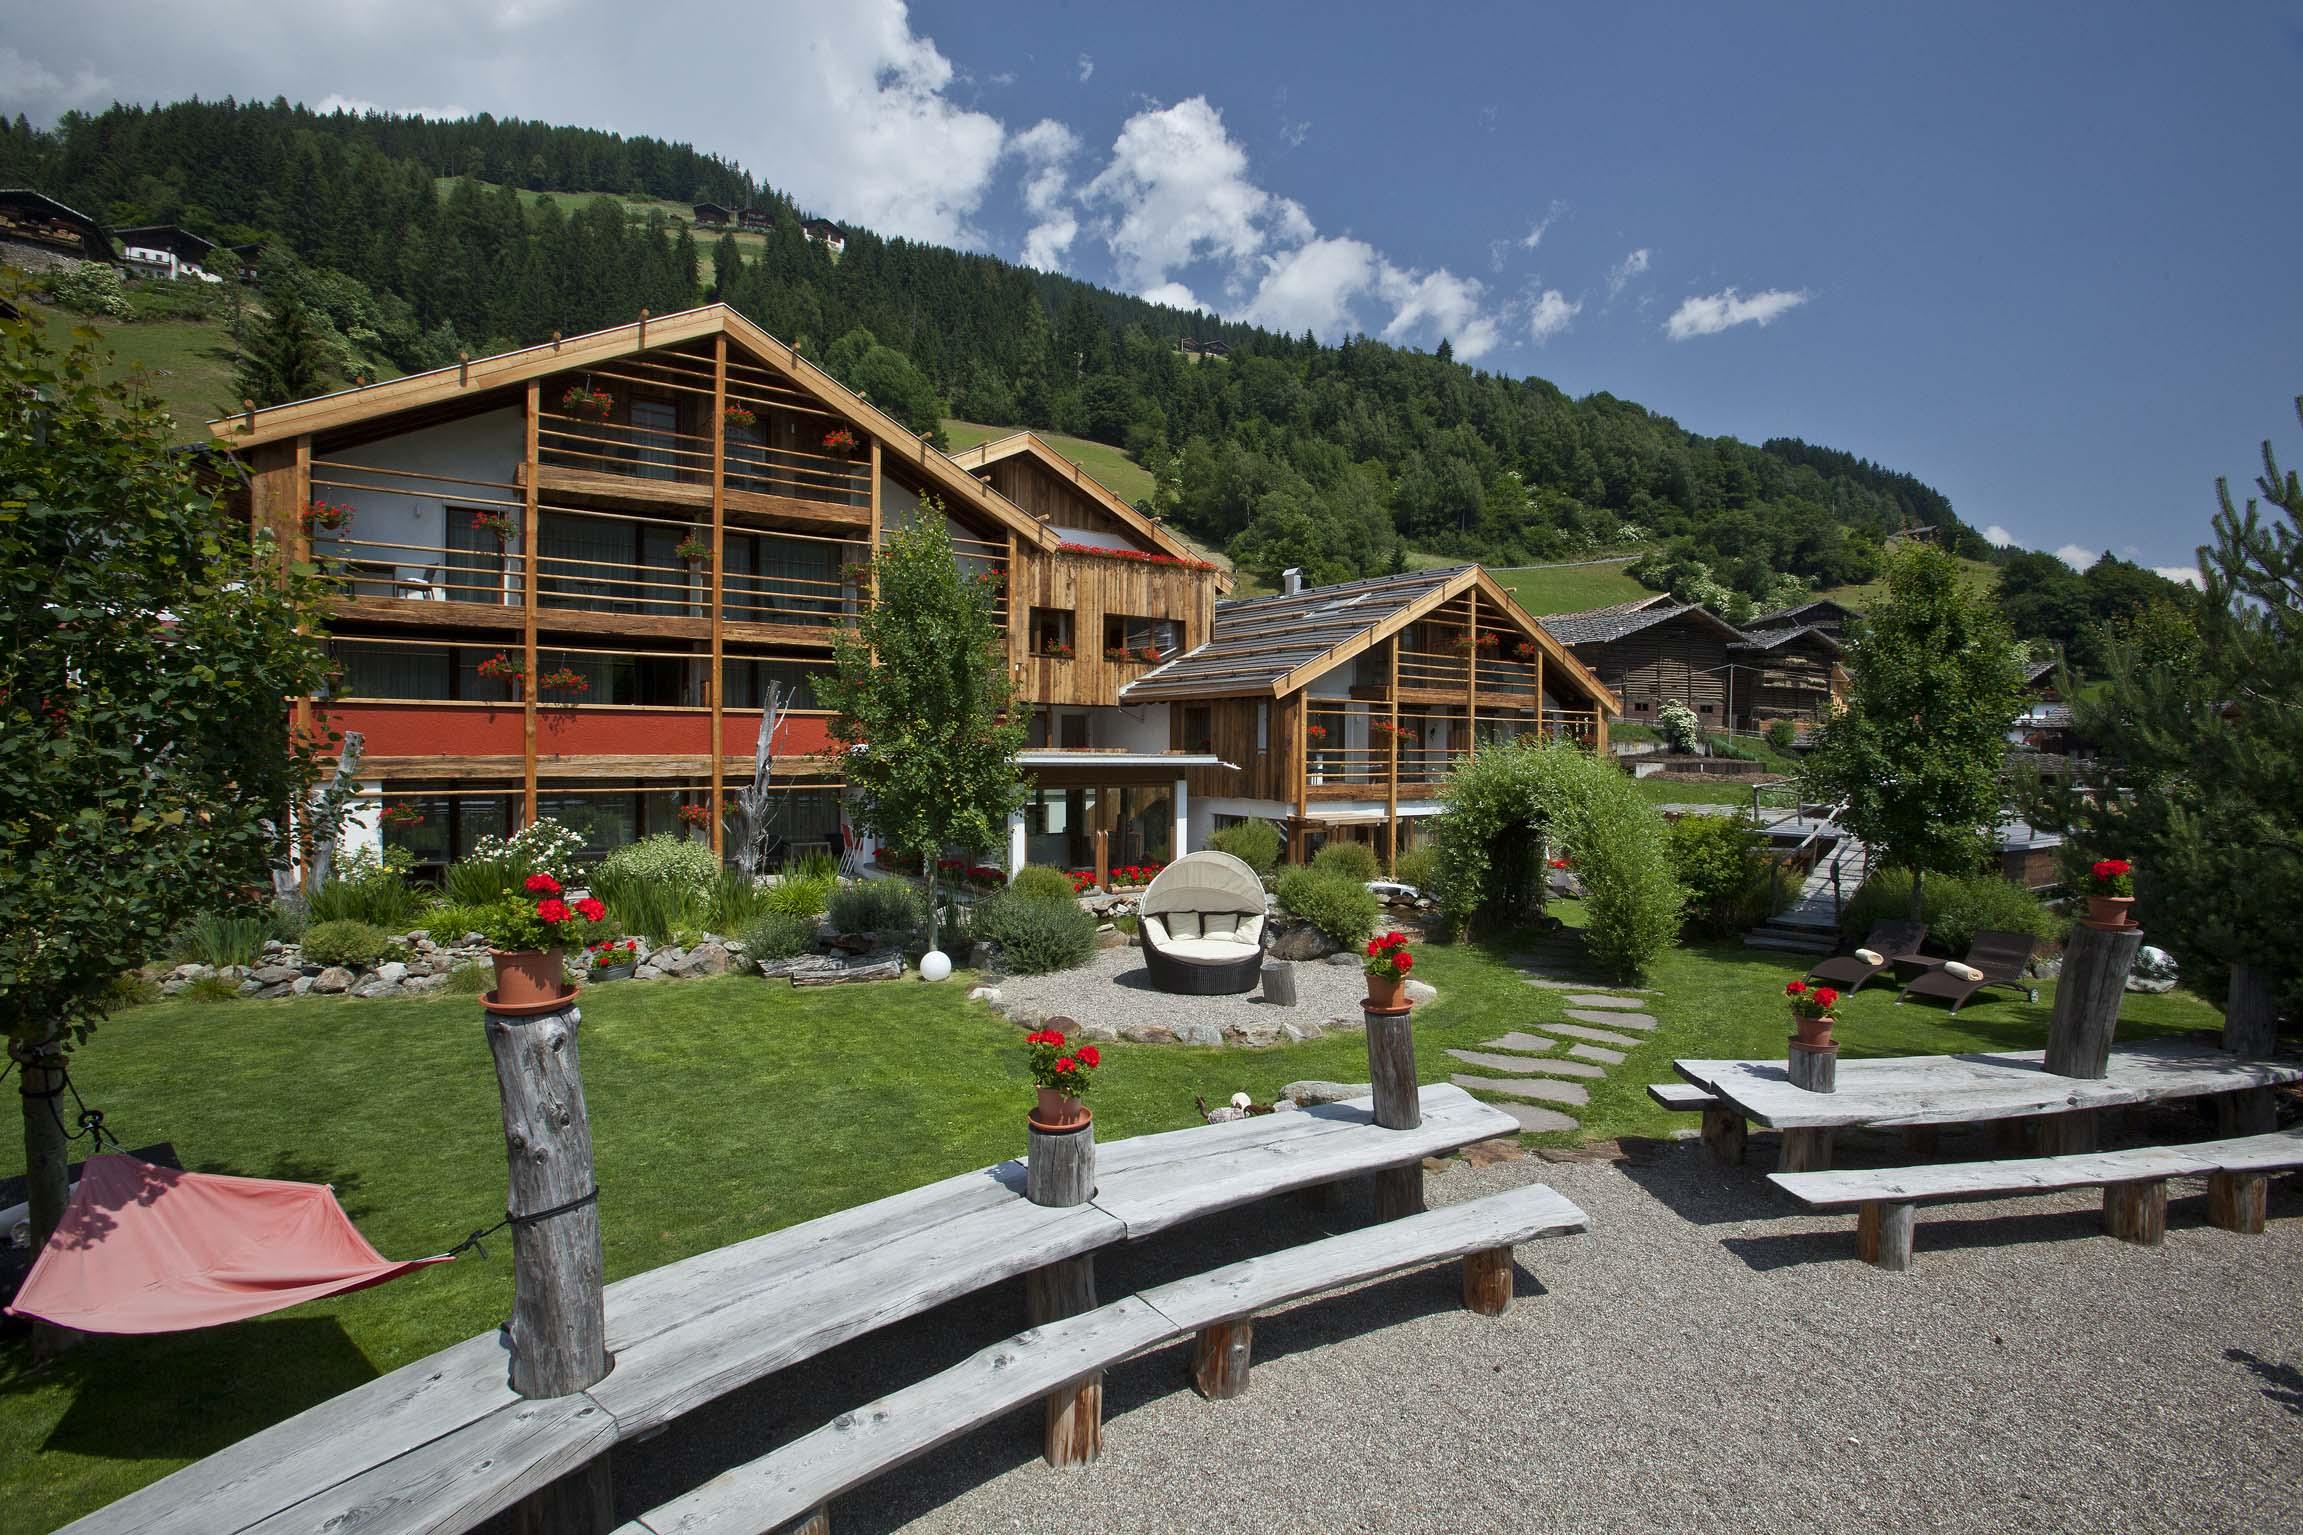 hotel-waltershof-ultental-suedtirol-italien-val-ultimo-alto-adige-italia